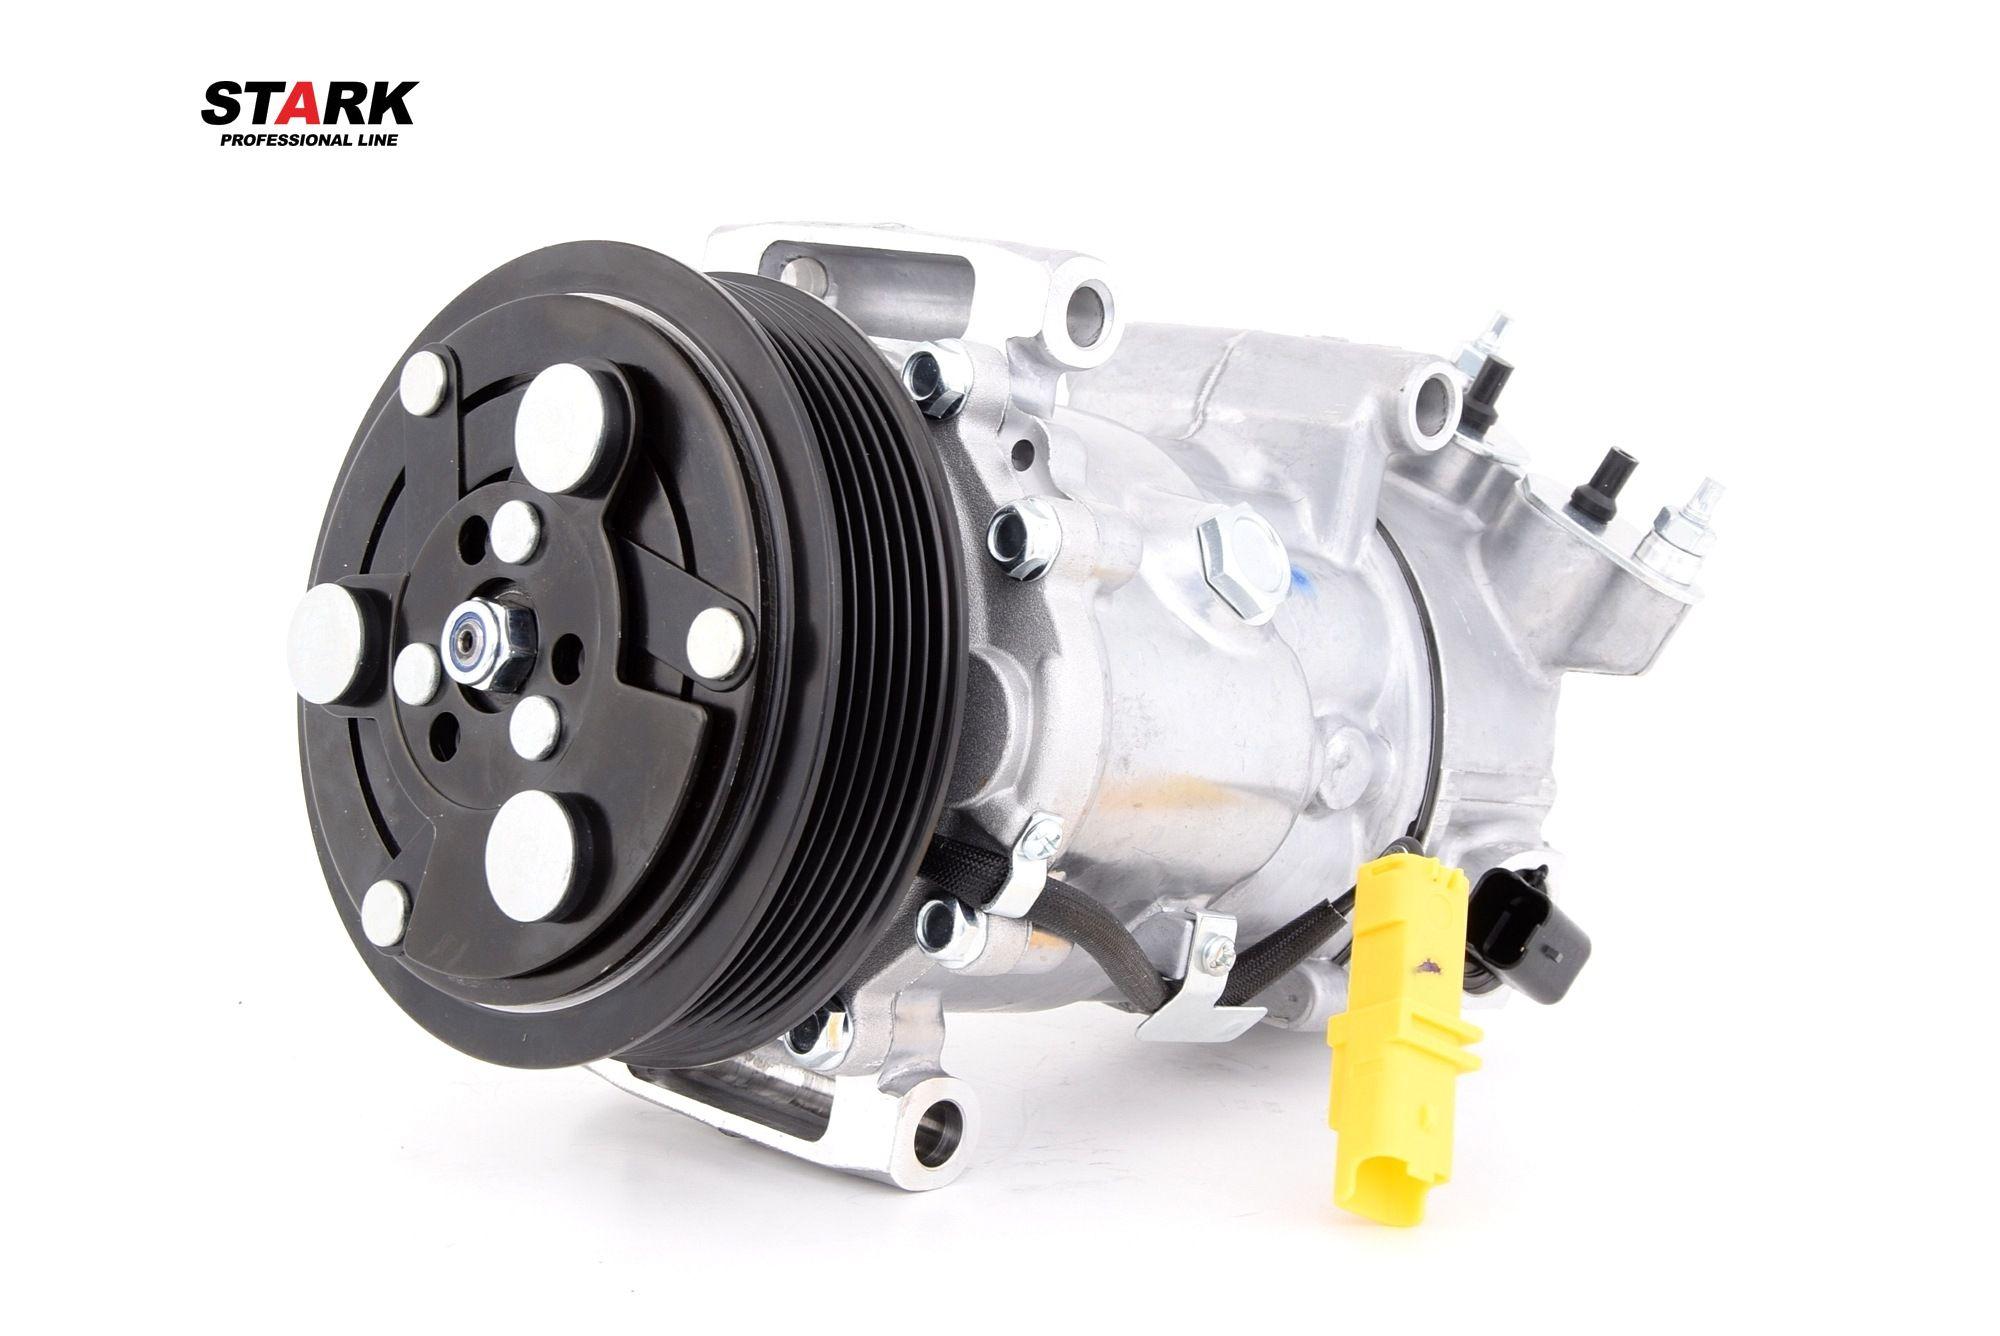 Origine Compresseur de climatisation STARK SKKM-0340062 (Poulies-Ø: 119mm)